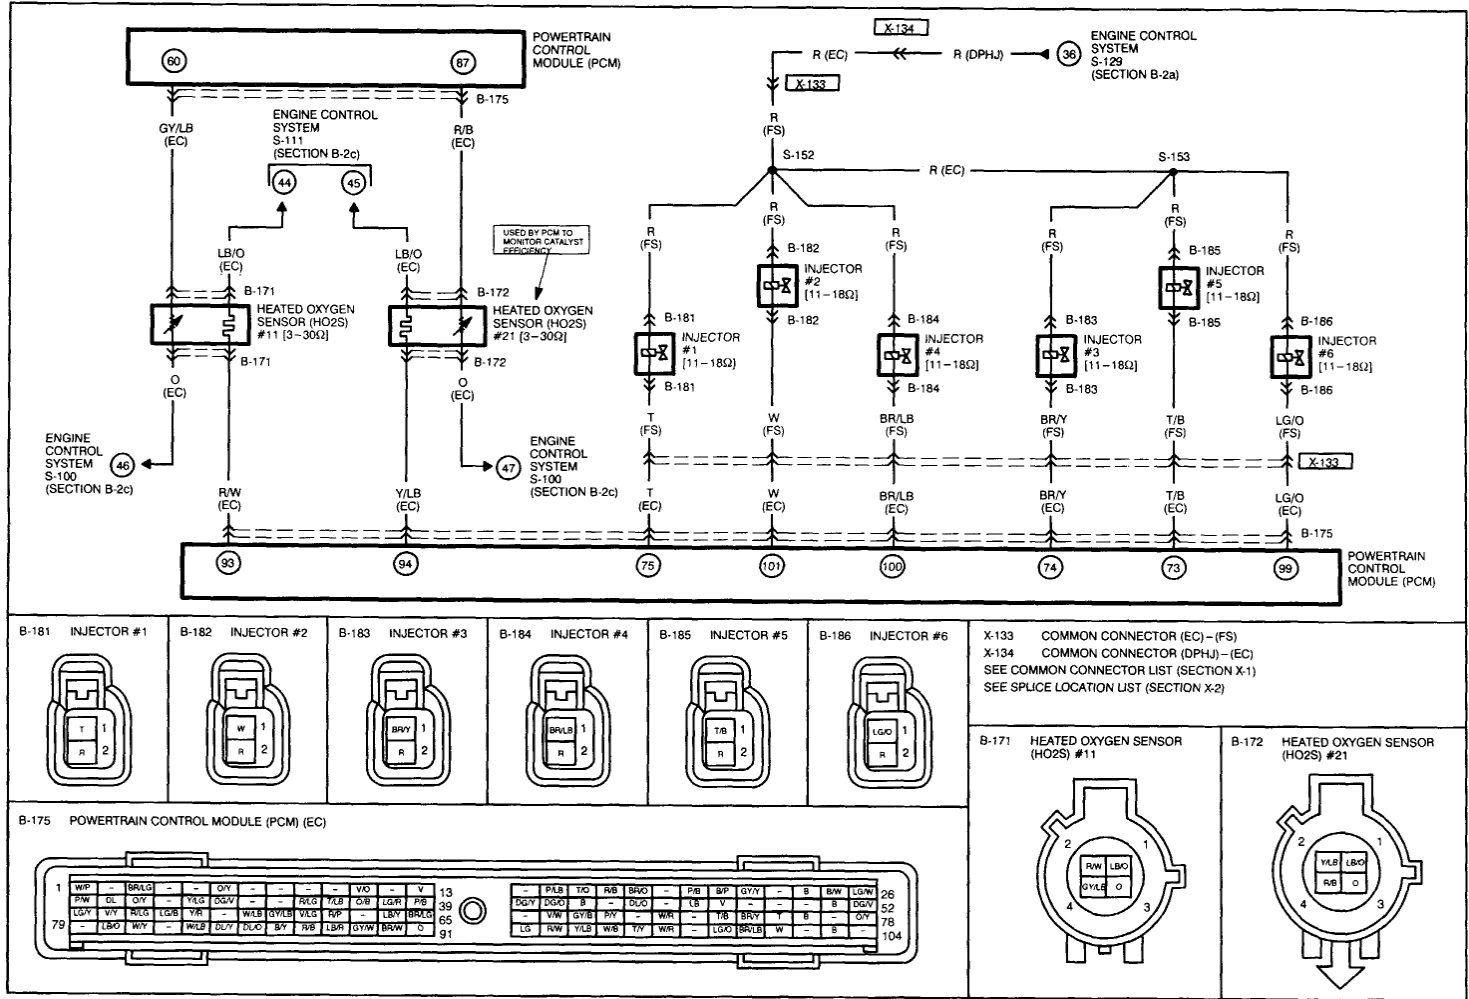 2003 Mazda Tribute 4wd Wiring Diagram Wiring Diagram Mute Resource Mute Resource Led Illumina It